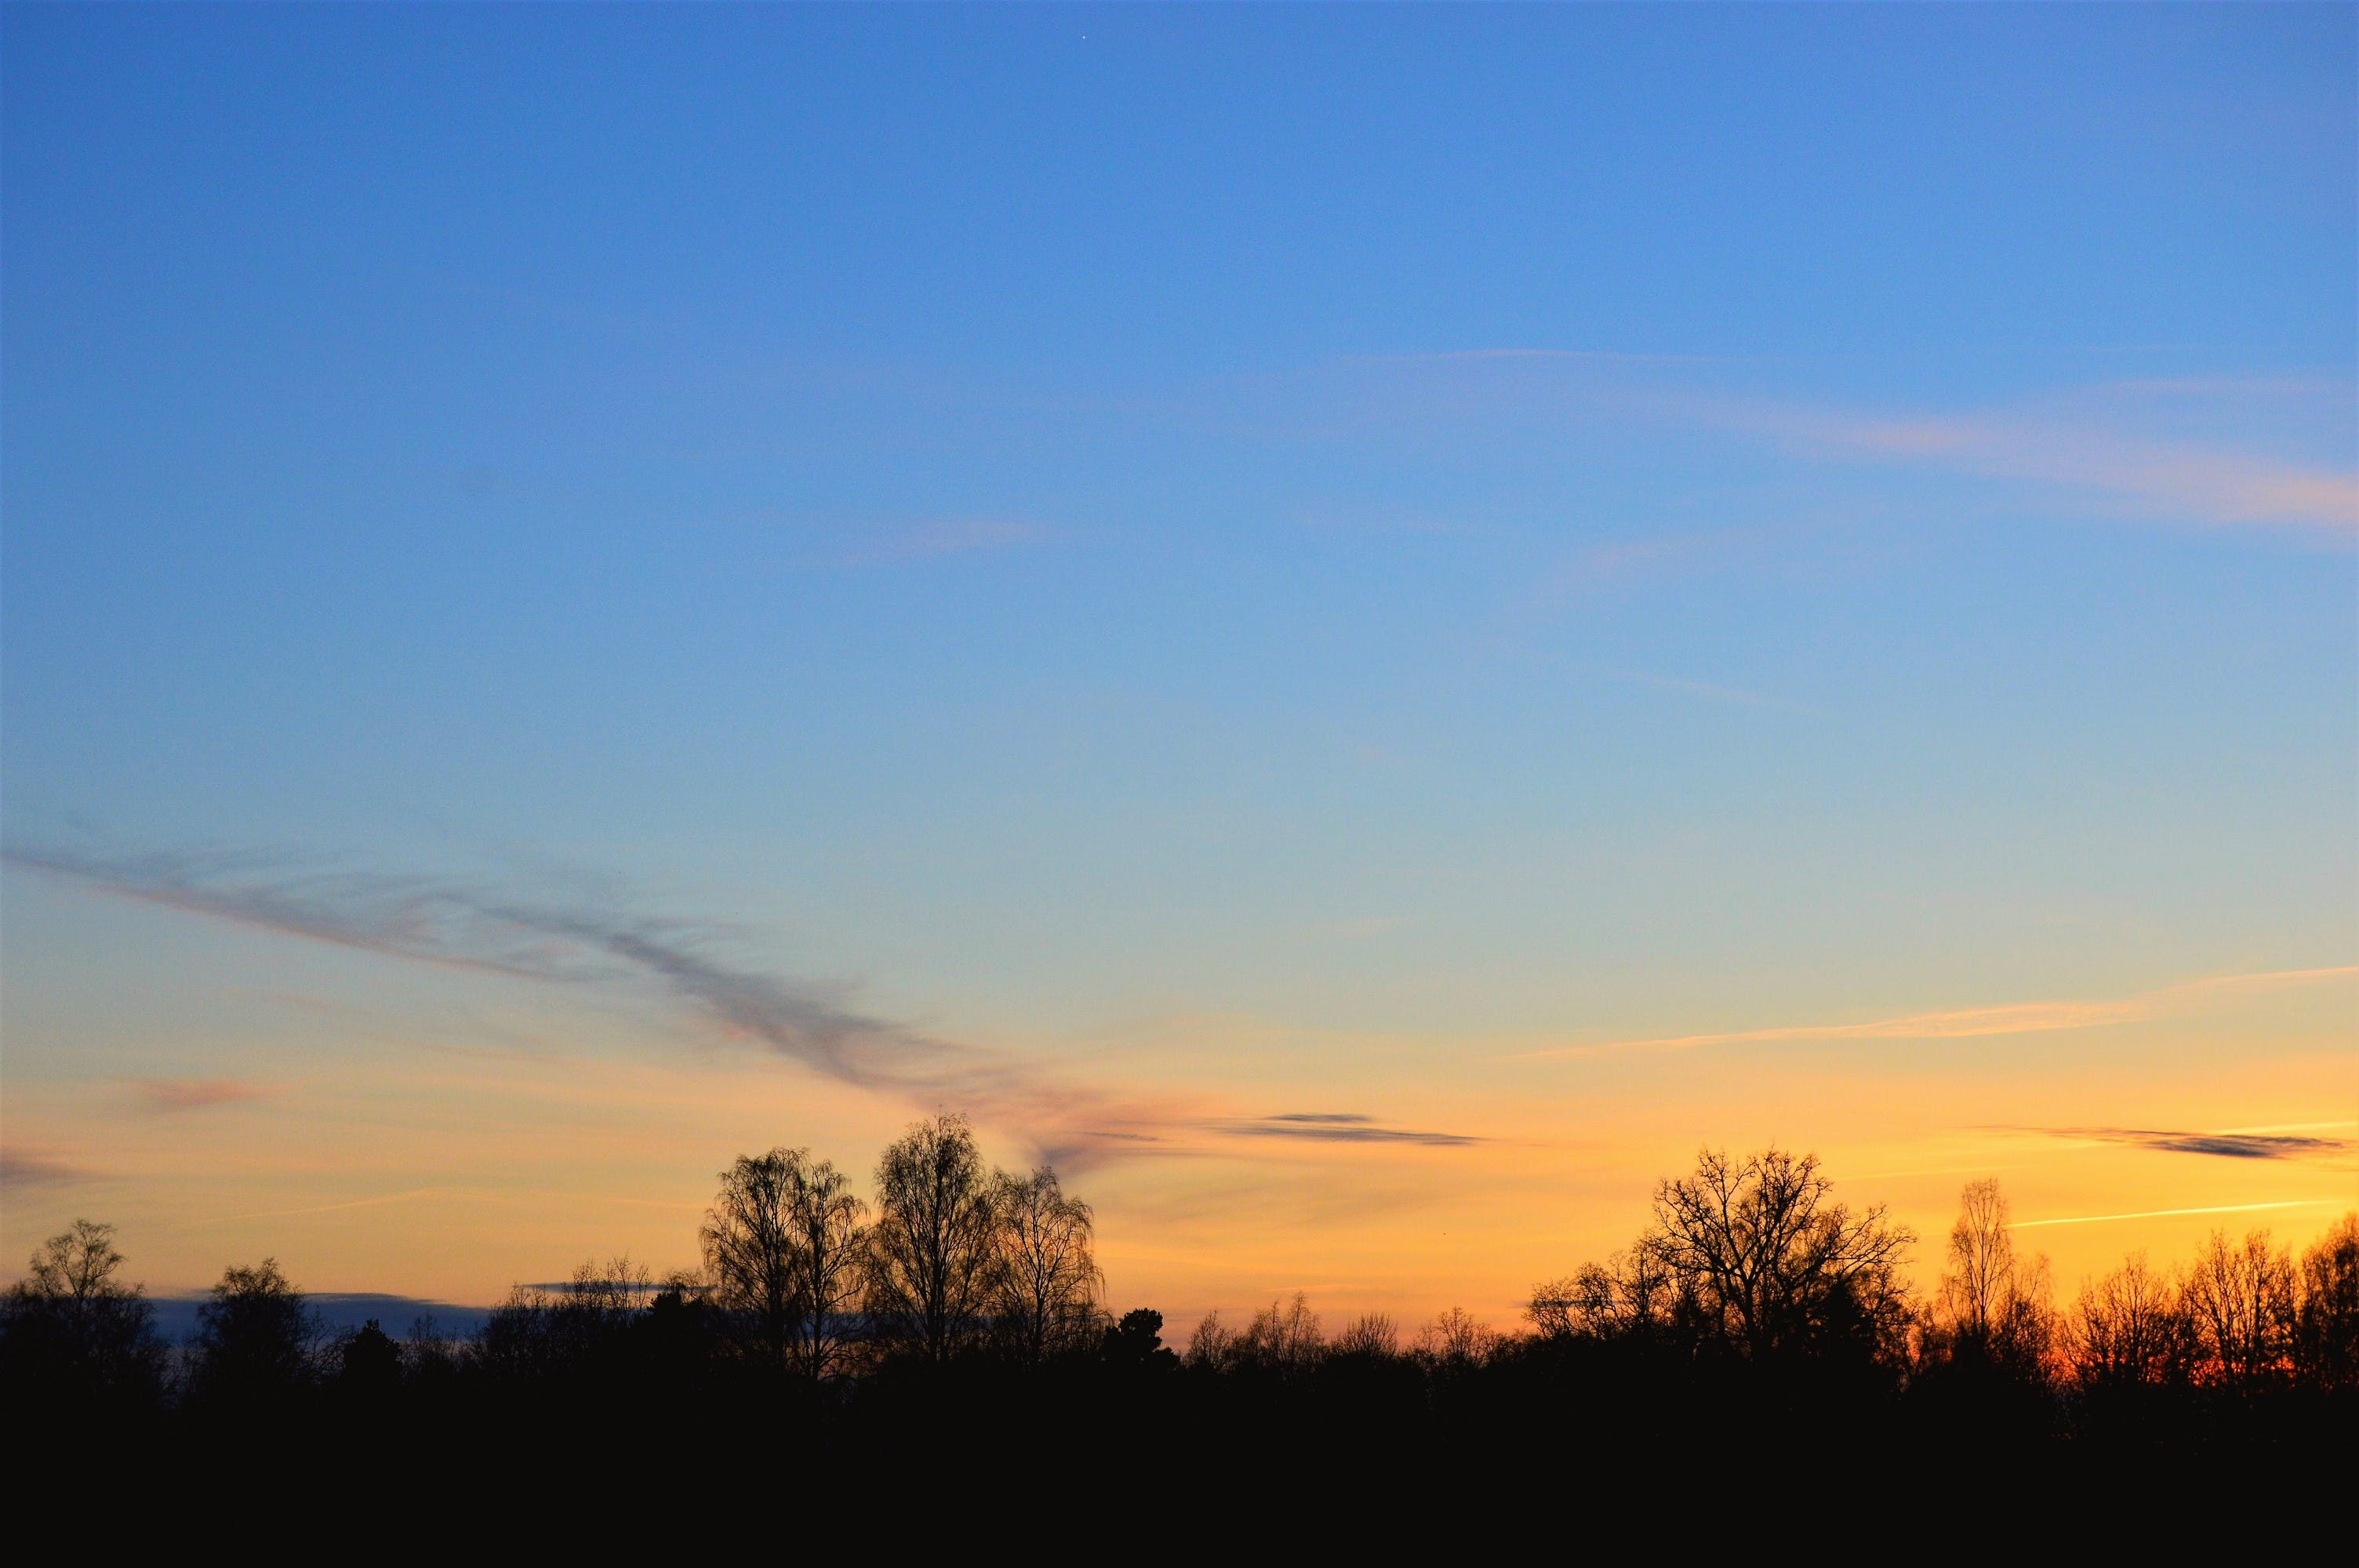 Free stock photo of landscape, nature, sunset, night